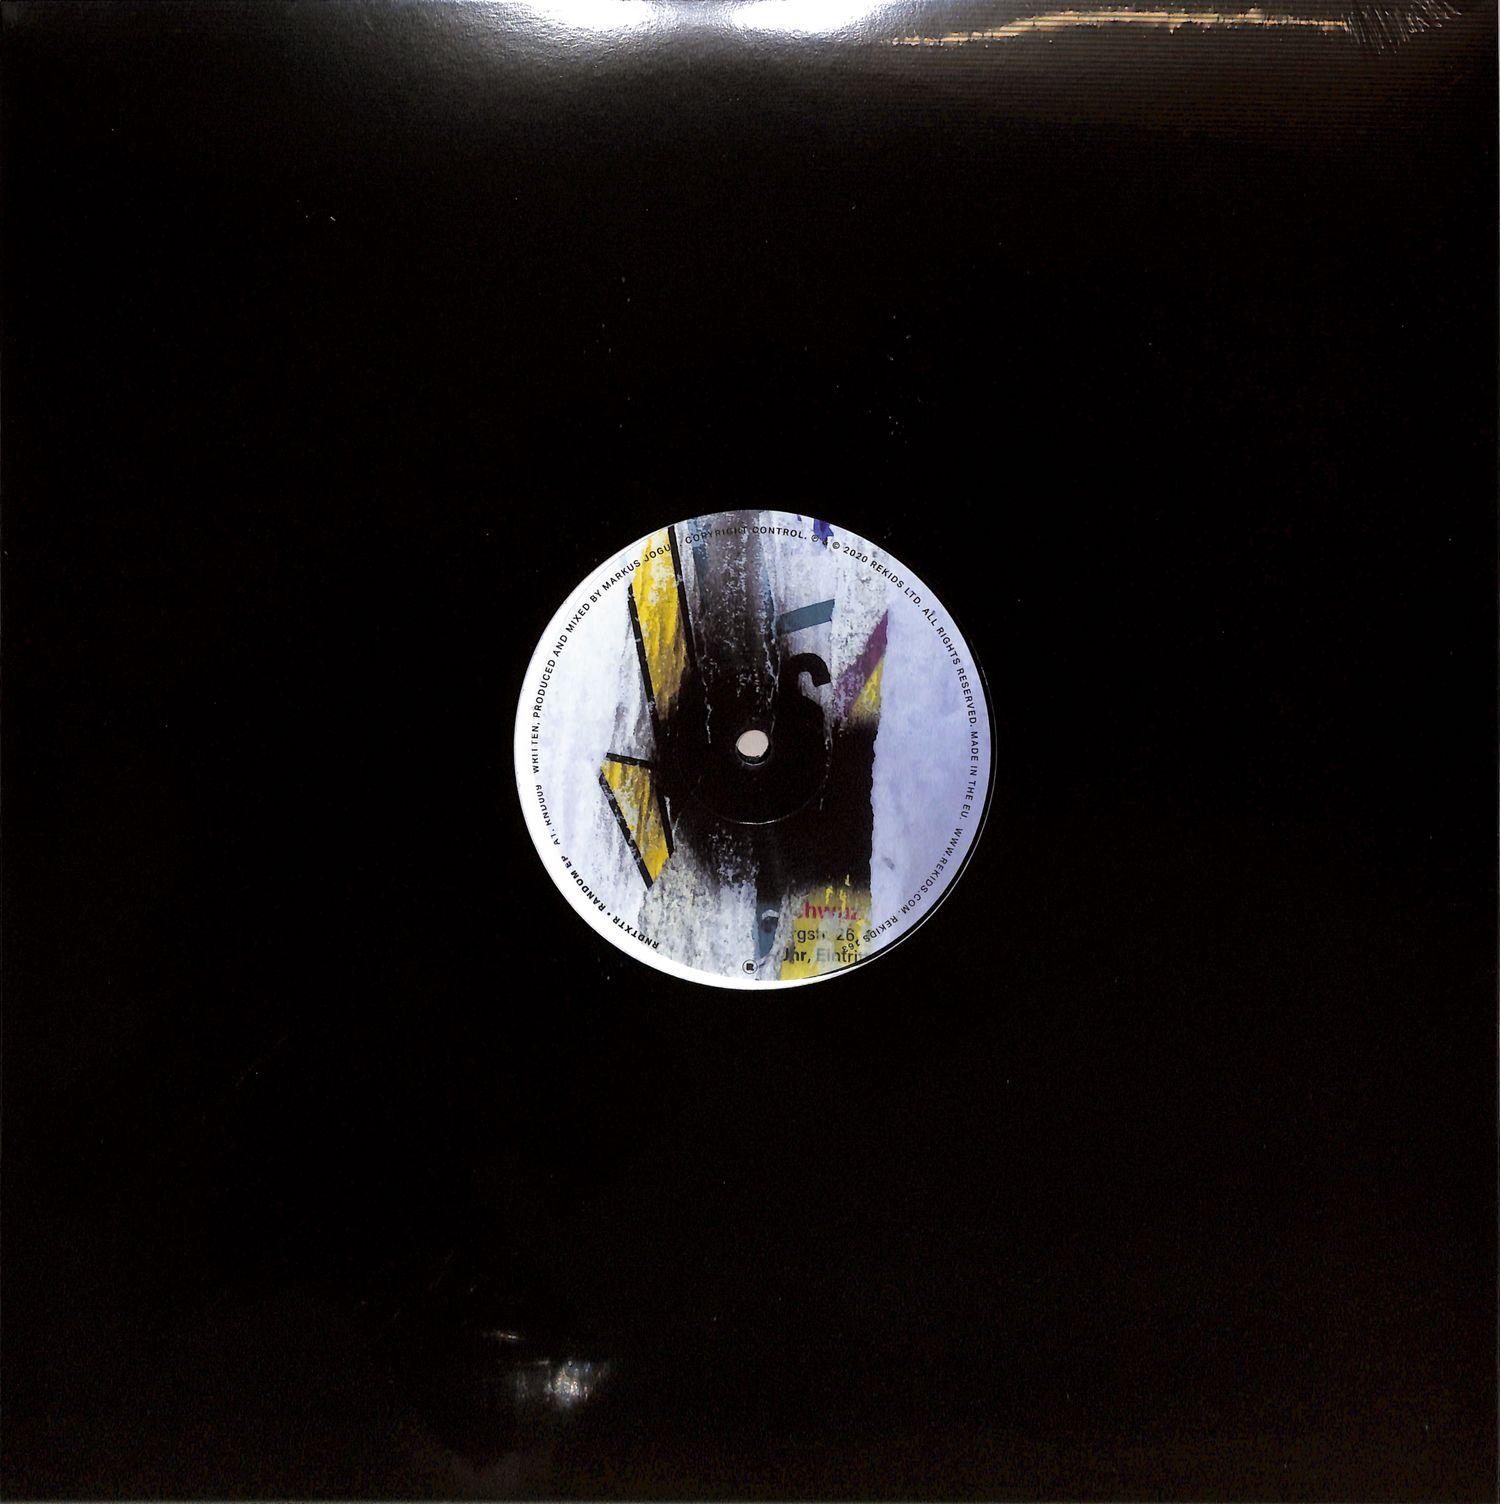 RNDTXTR - RANDOM EP